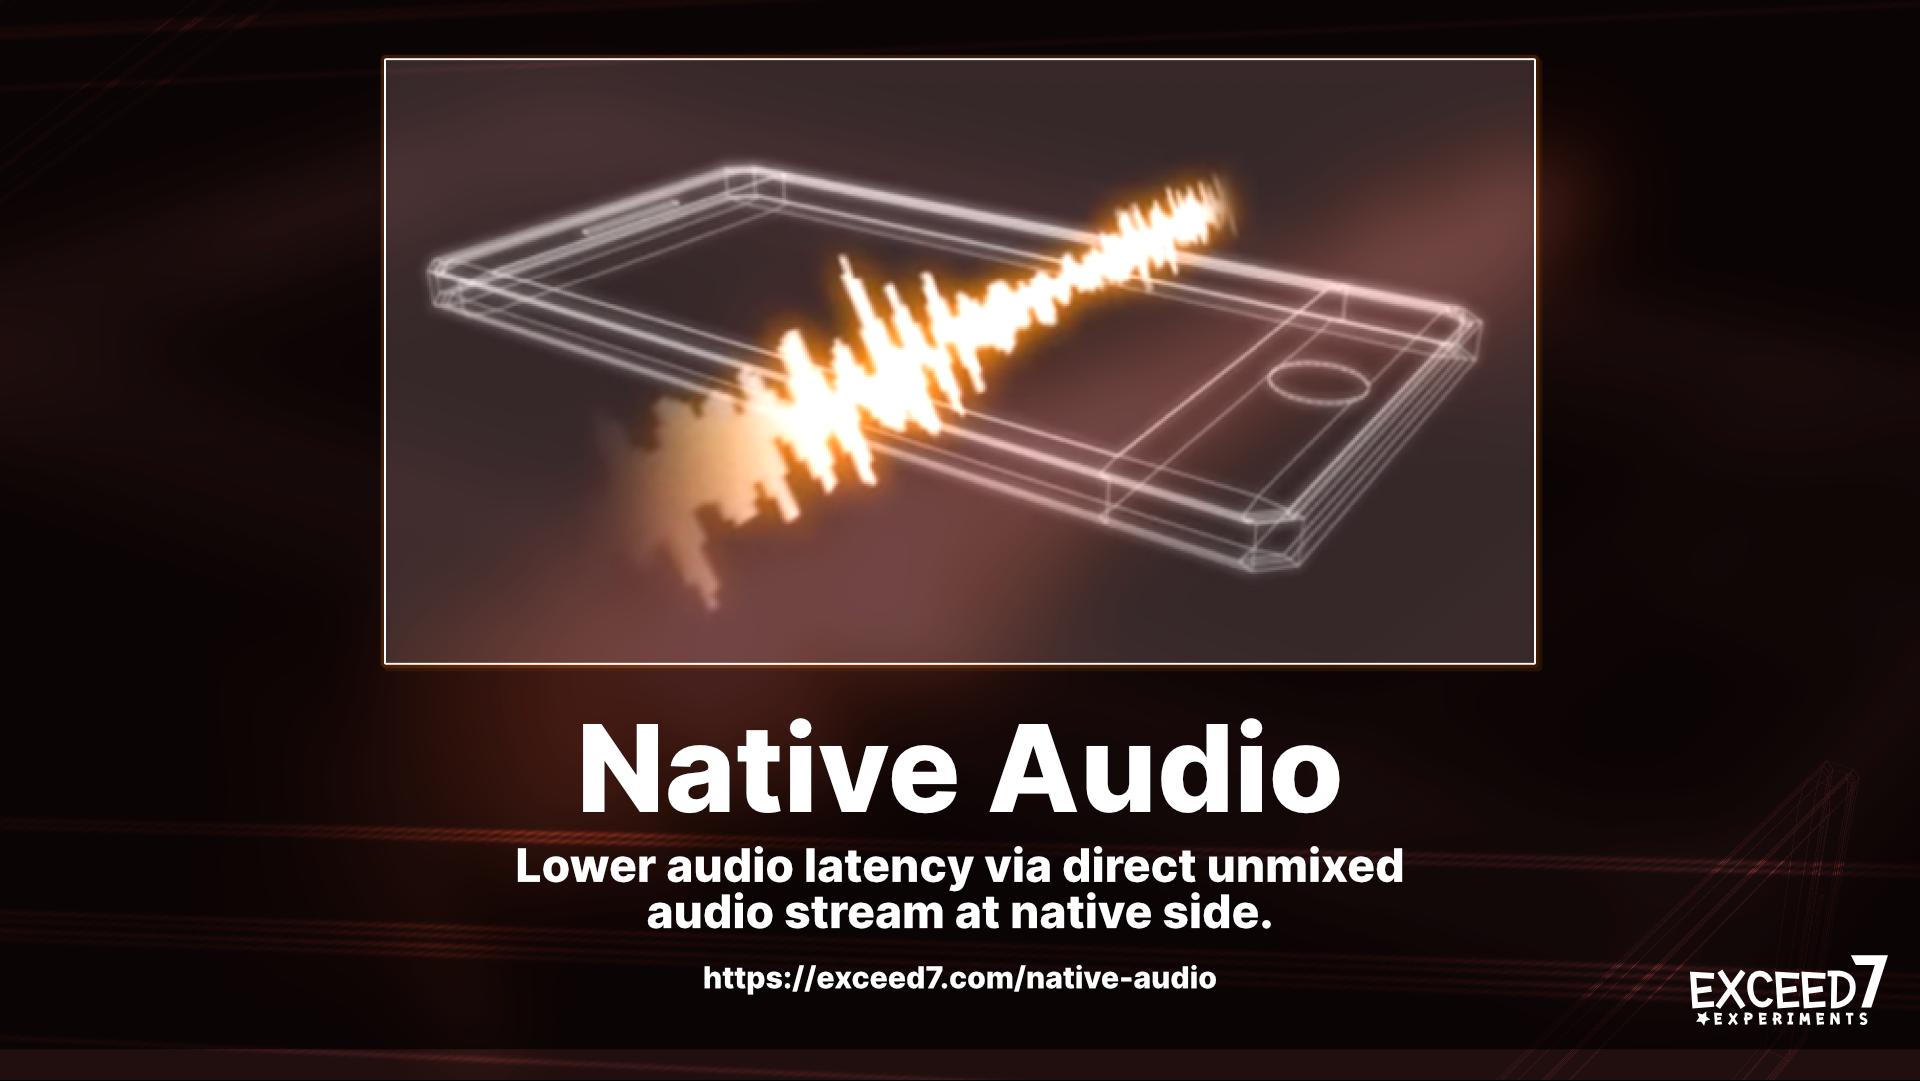 Native Audio - Lower audio latency via OS's native library